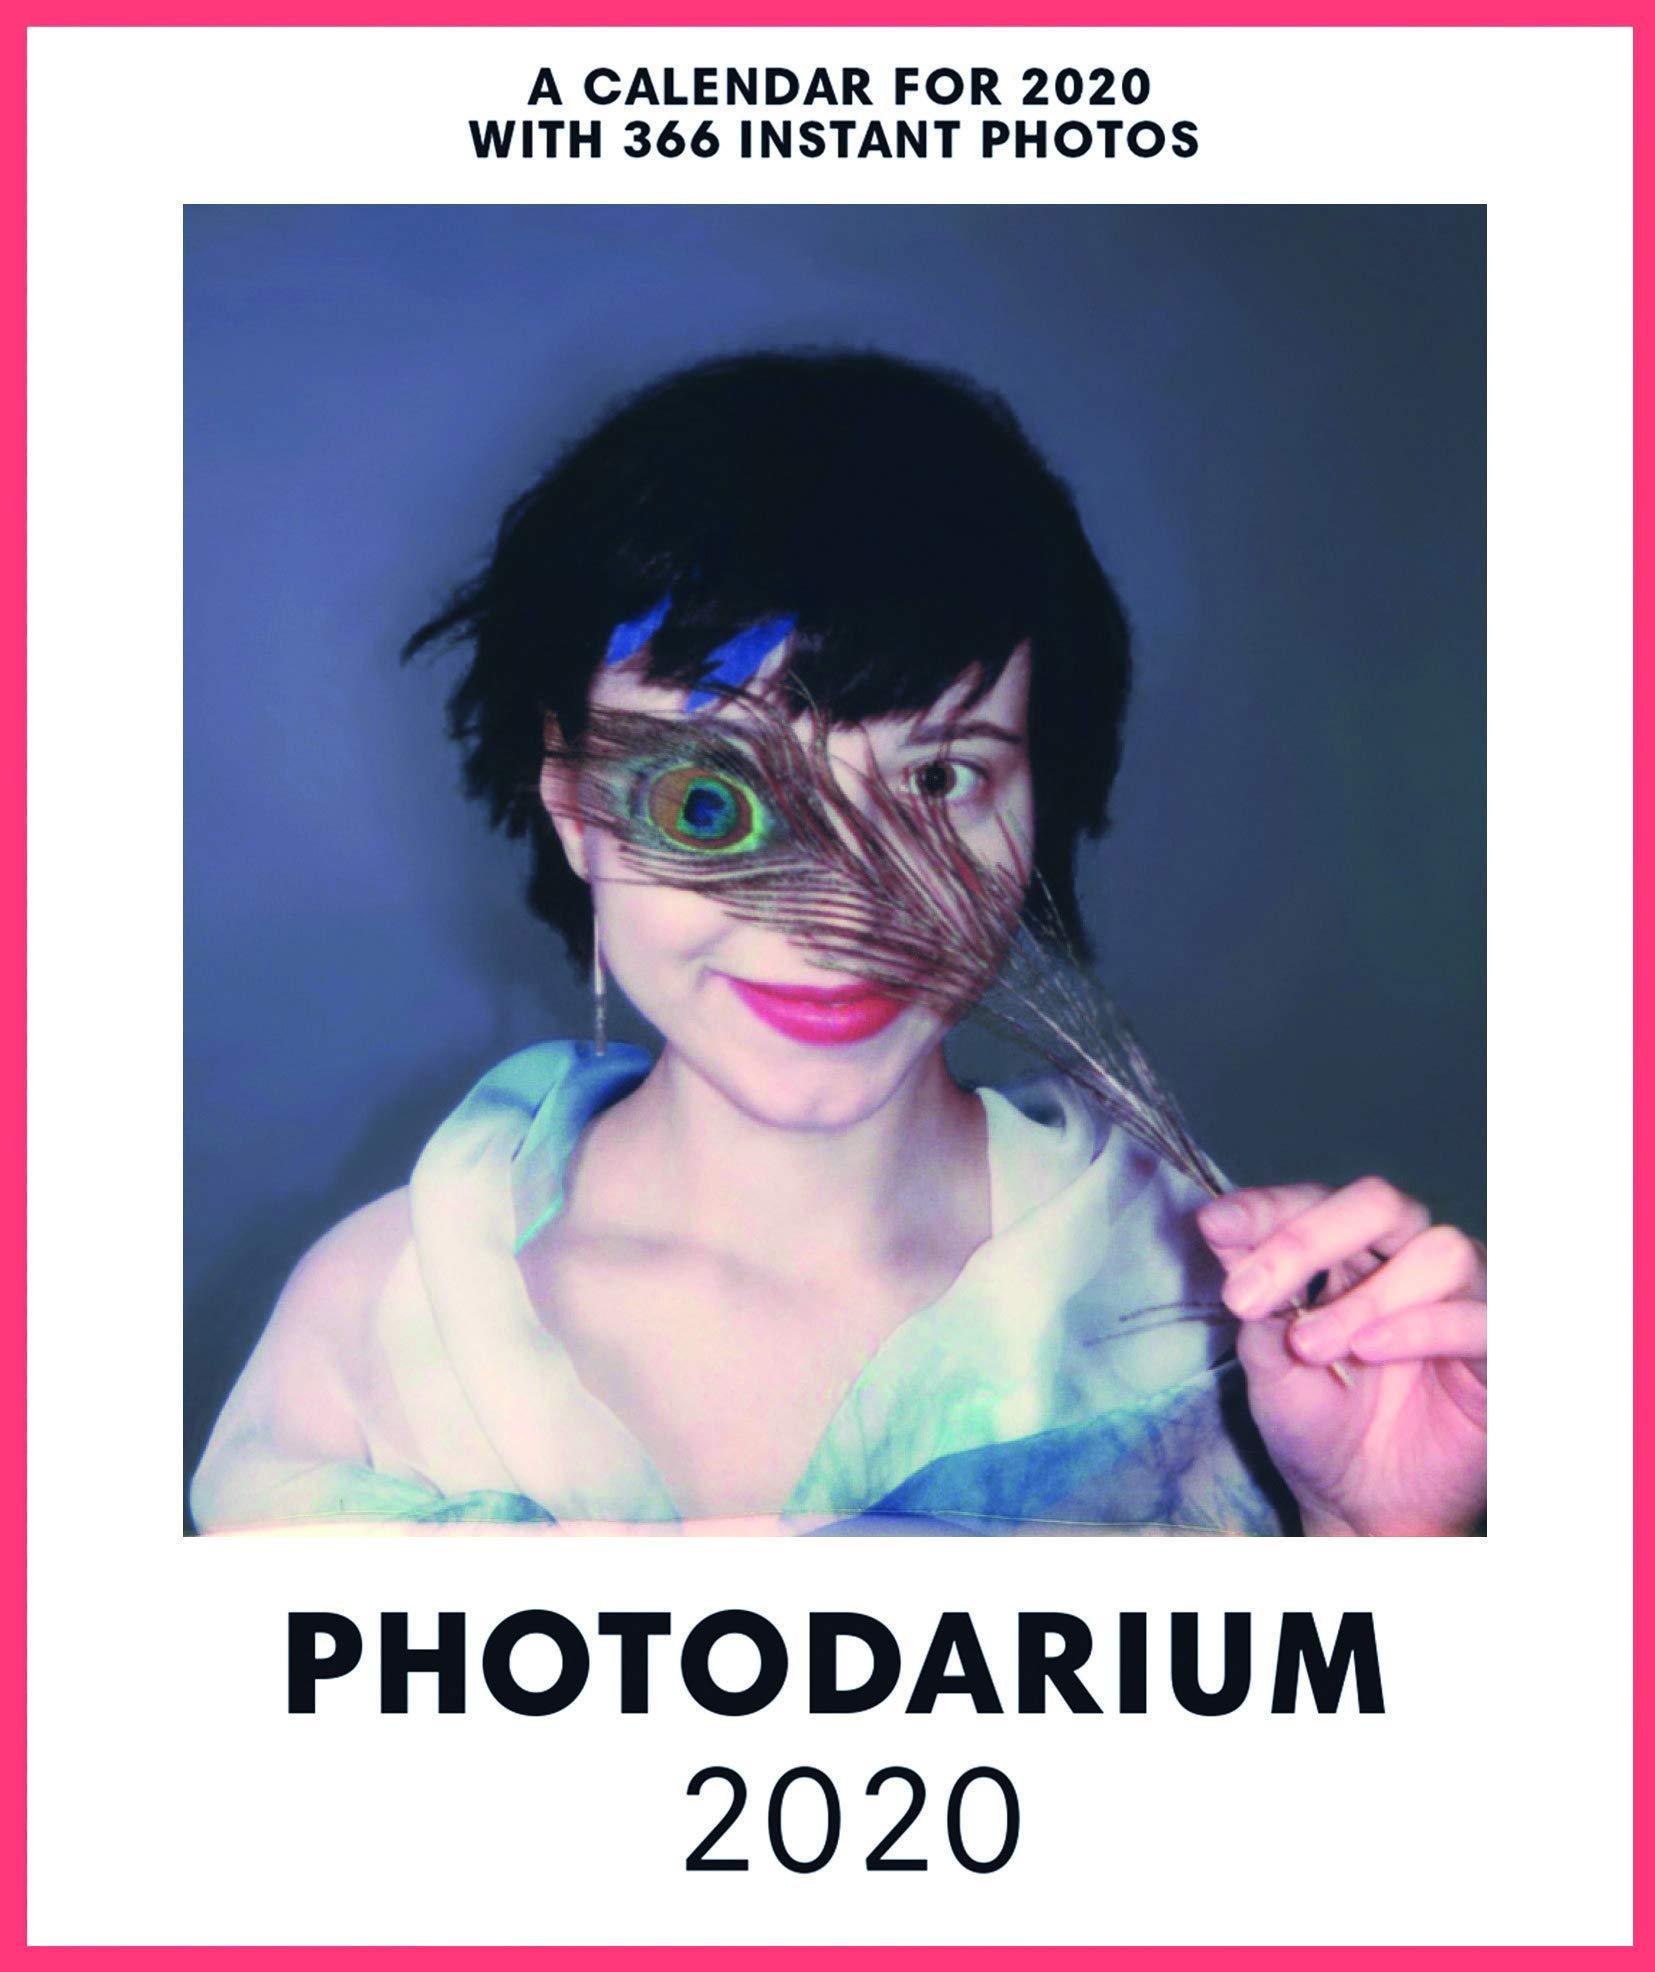 PHOTODARIUM 2020  Every Day A New Instant Photo  Calendars 2020